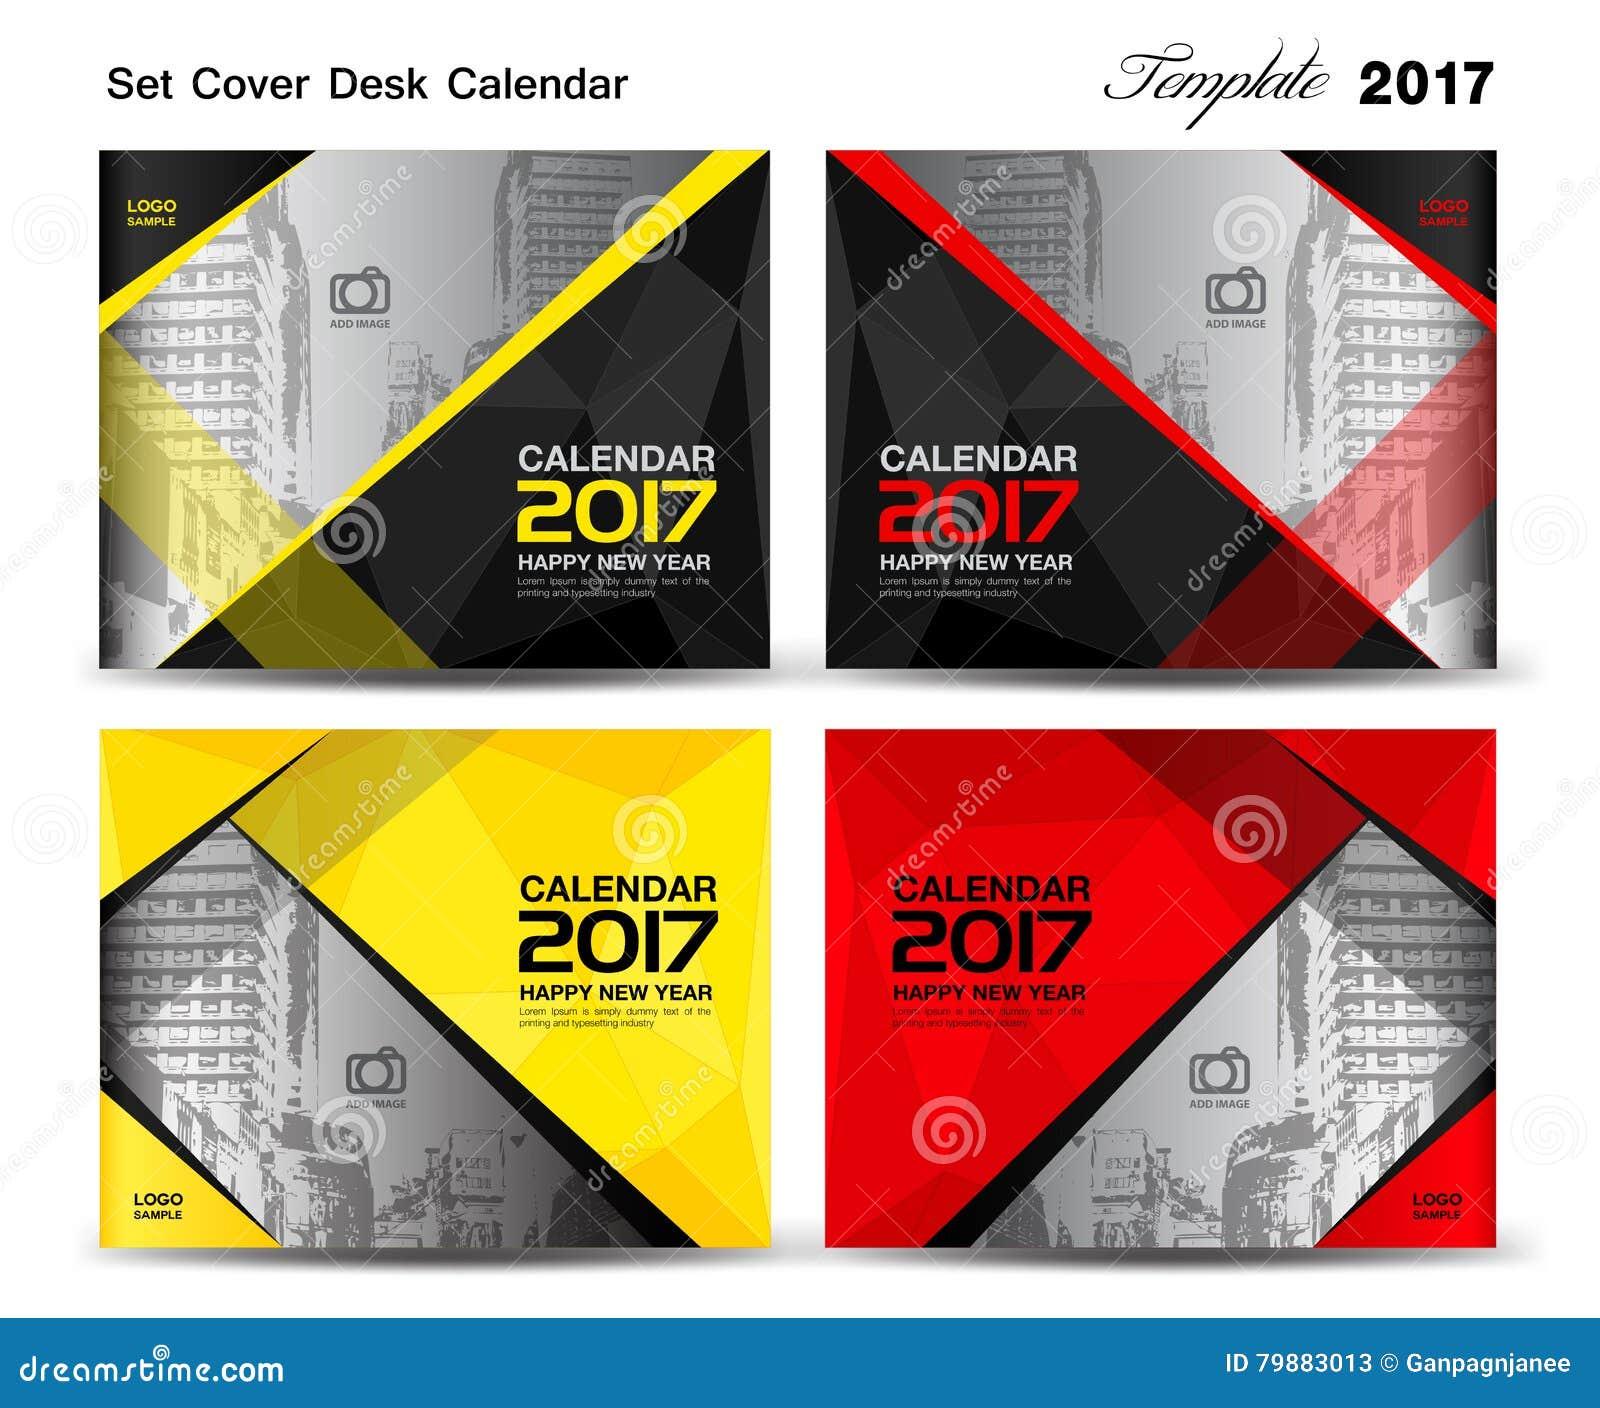 Year Calendar Design : Set cover desk calendar year template design